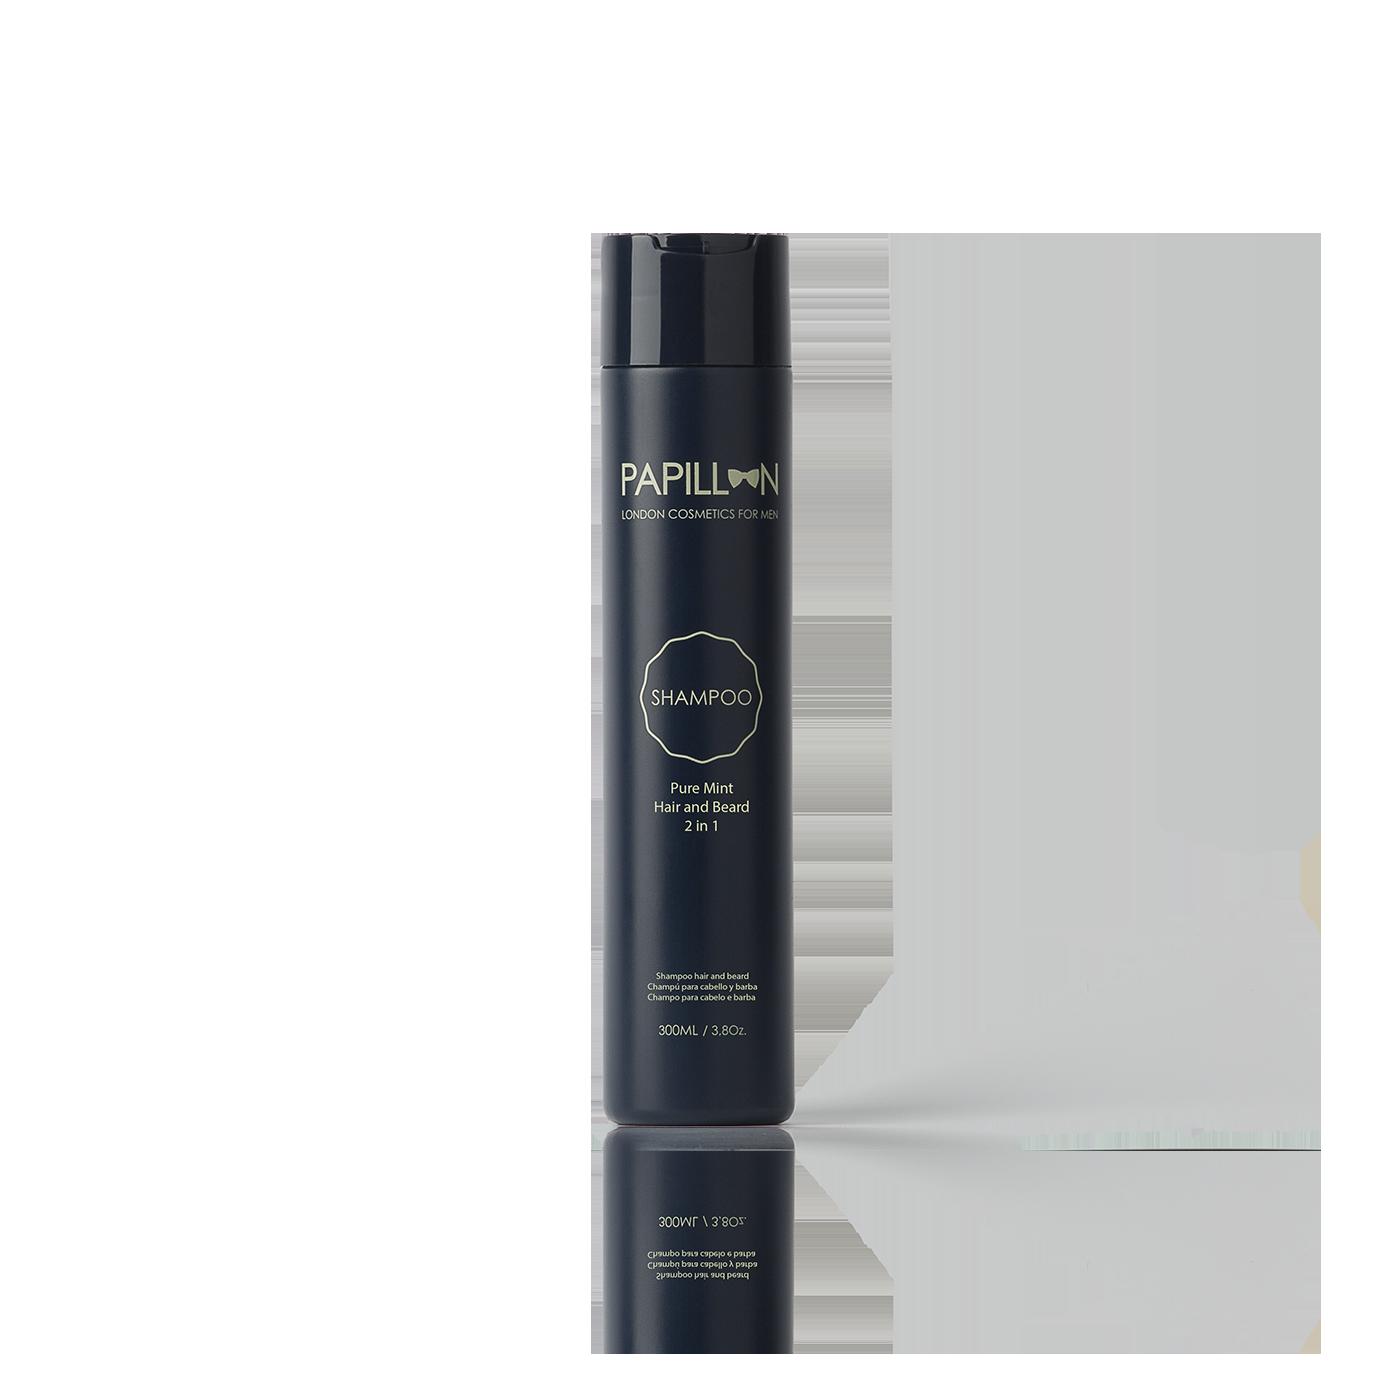 PAPILLON Pure Mint – Hair and Beard Shampoo